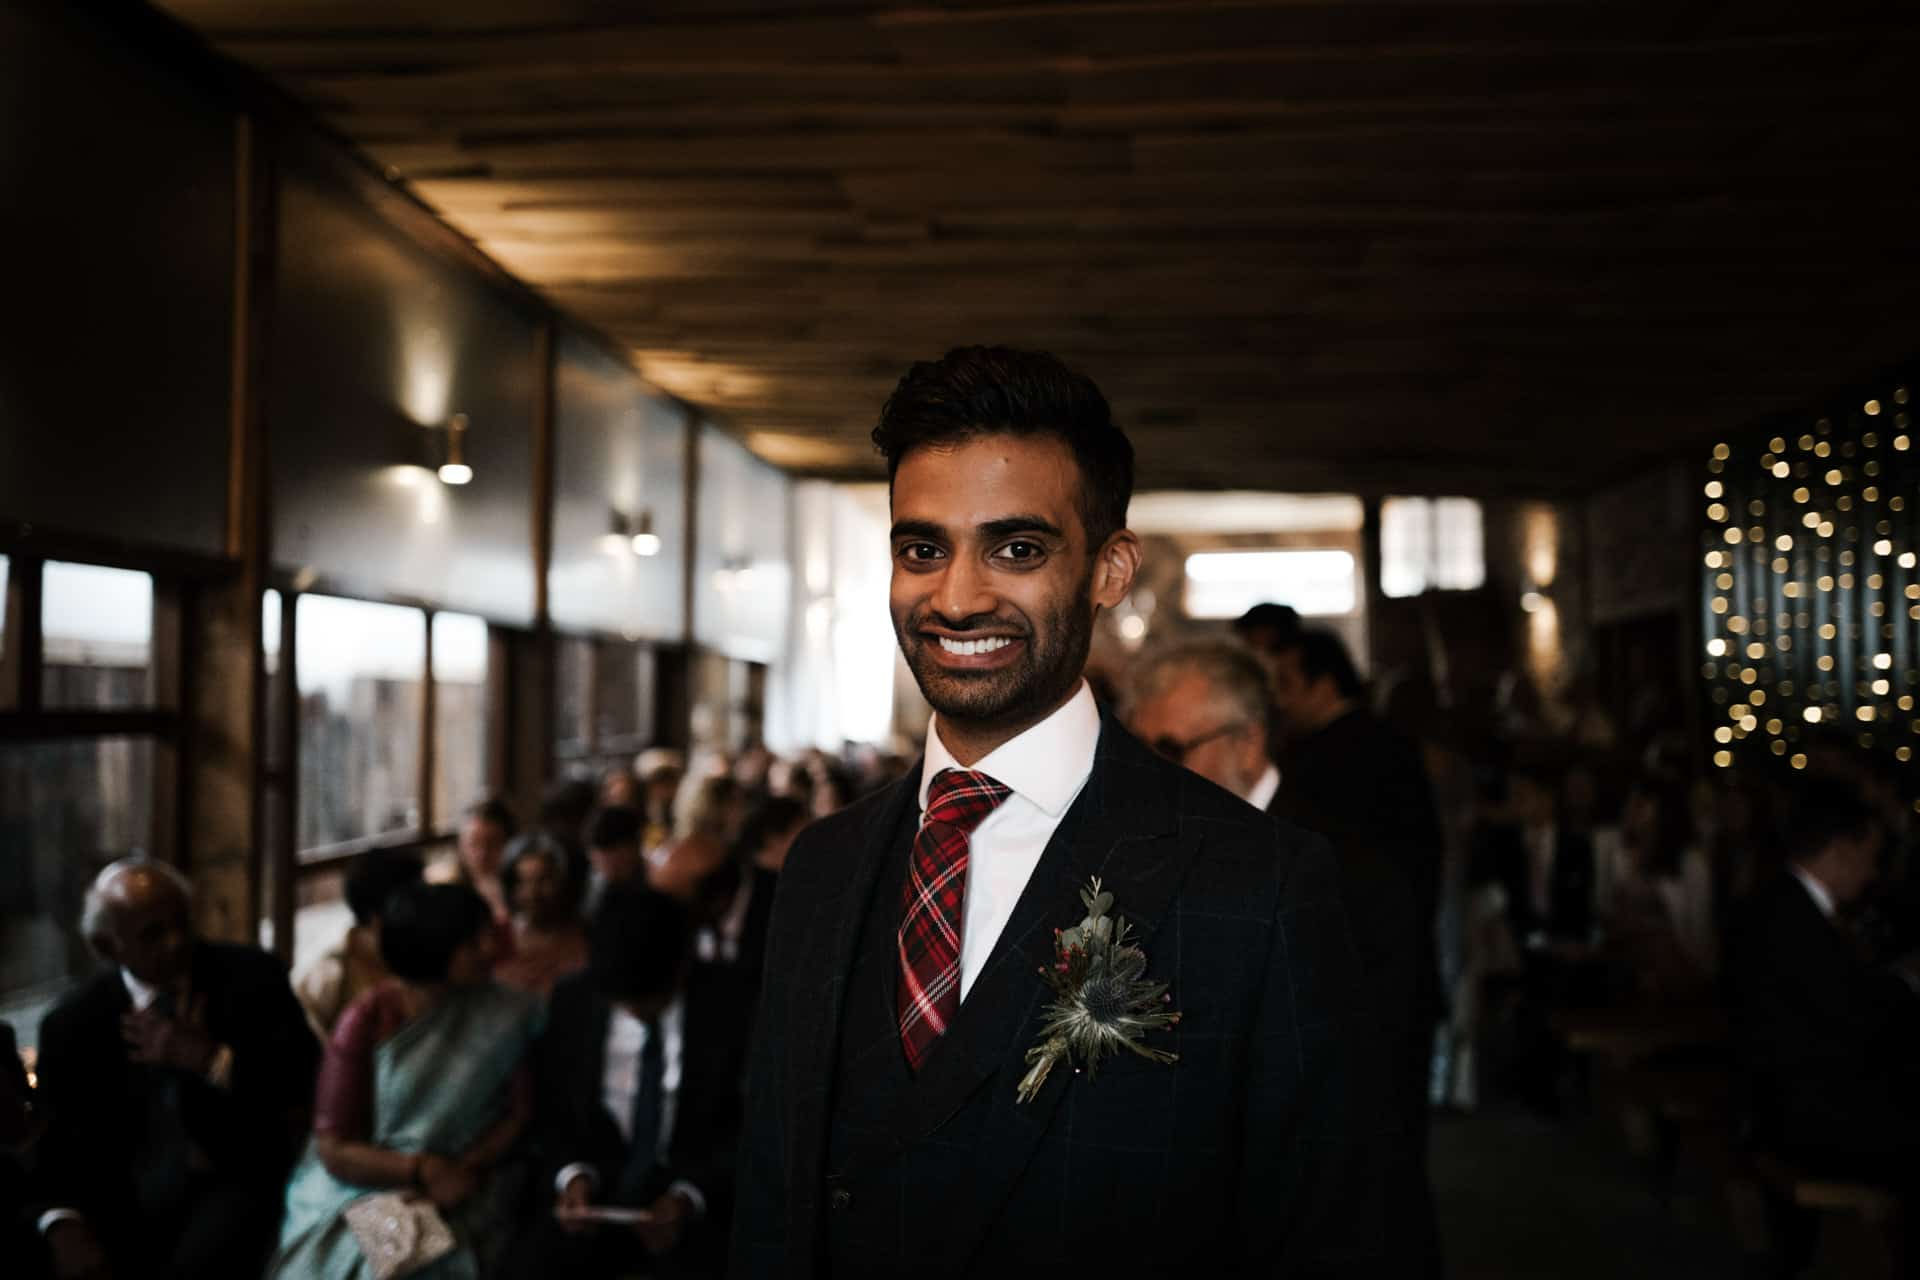 Excited groom